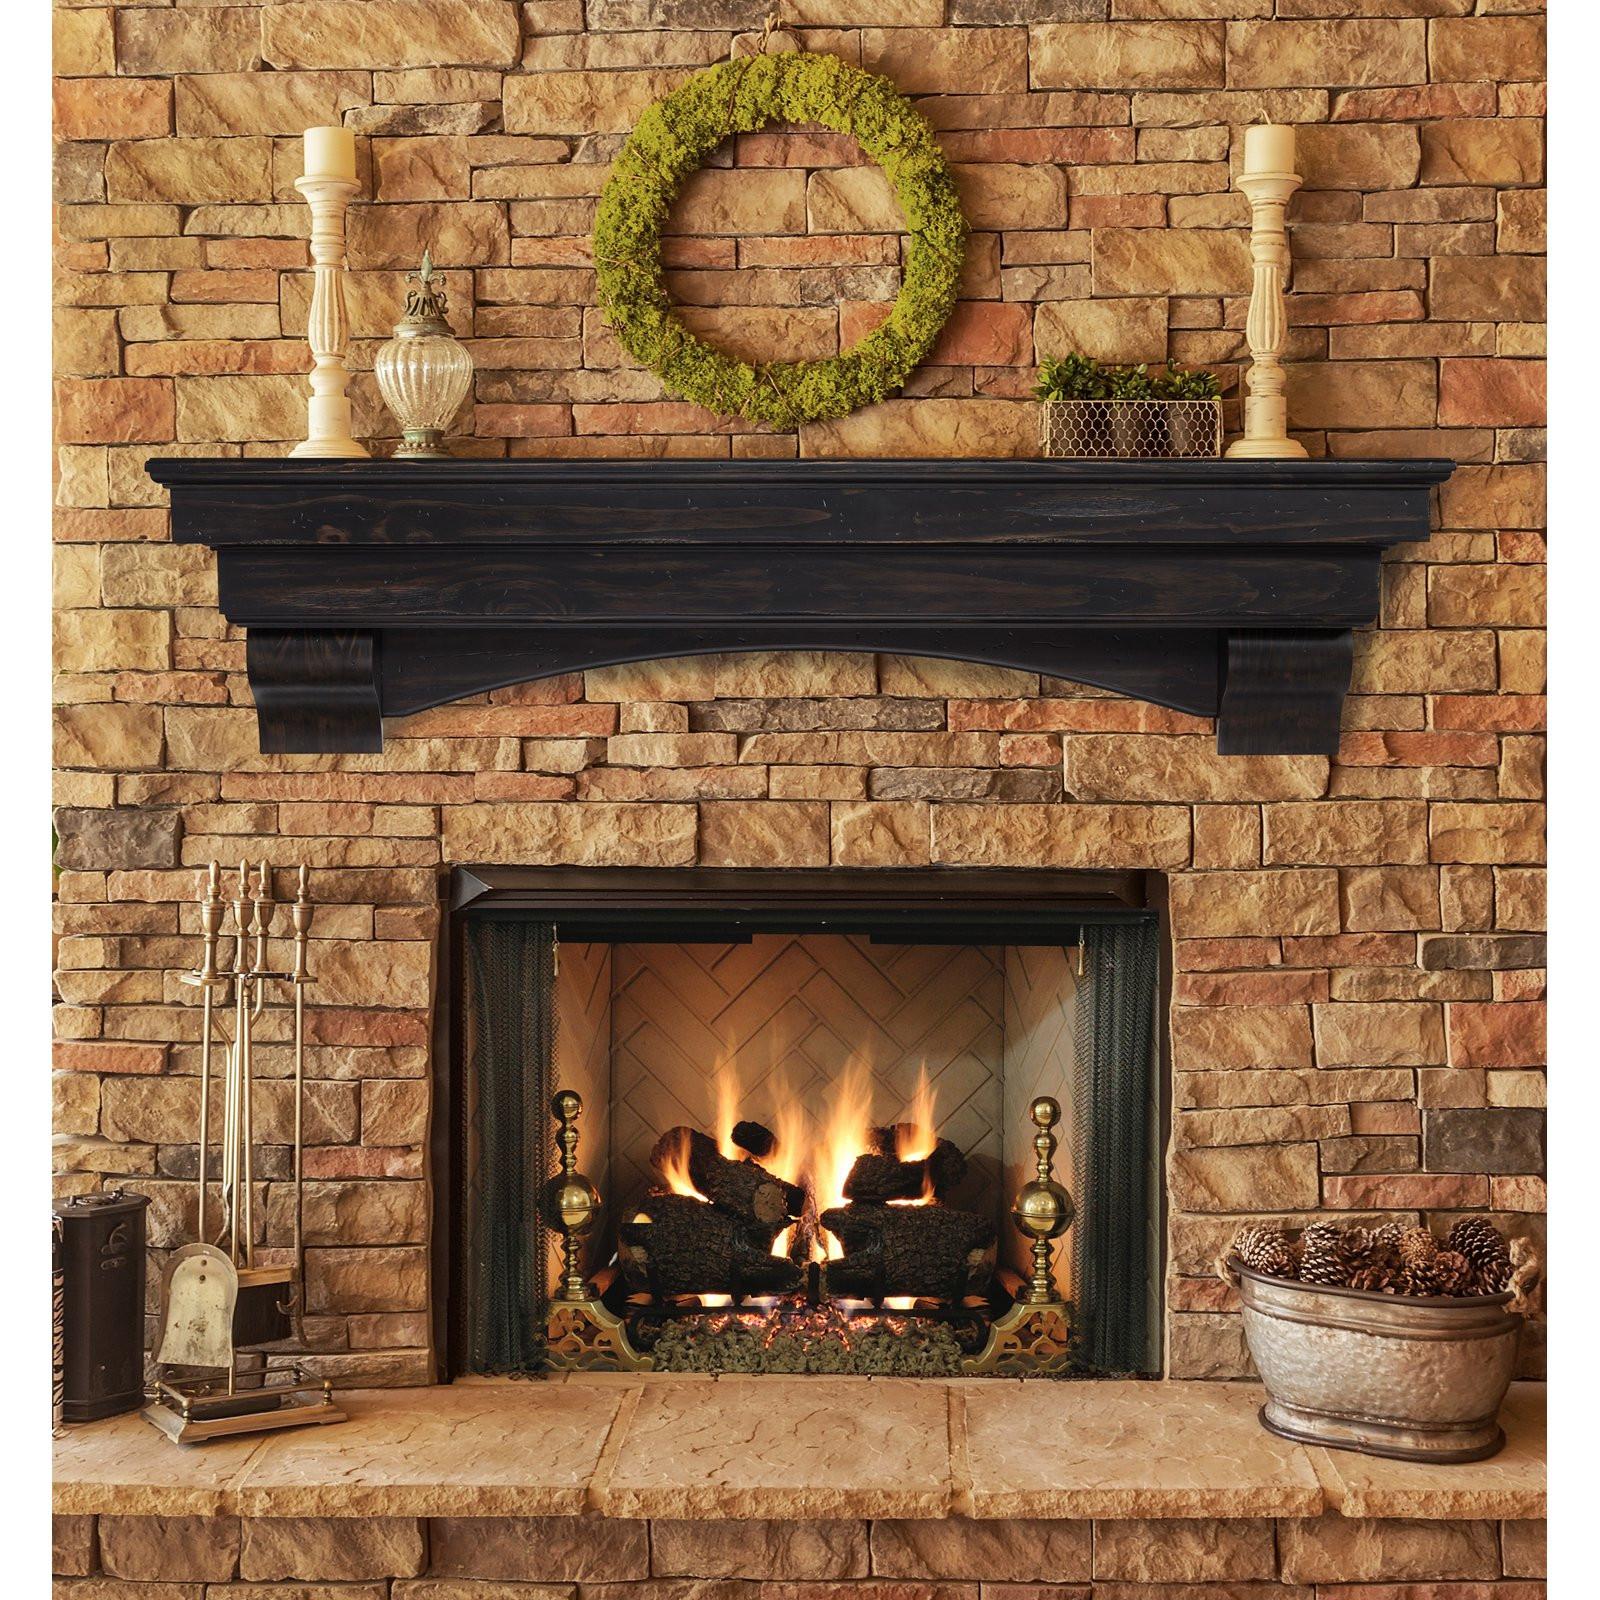 Best ideas about Fireplace Mantel Shelf . Save or Pin Pearl Mantels Celeste Fireplace Mantel Shelf Fireplace Now.